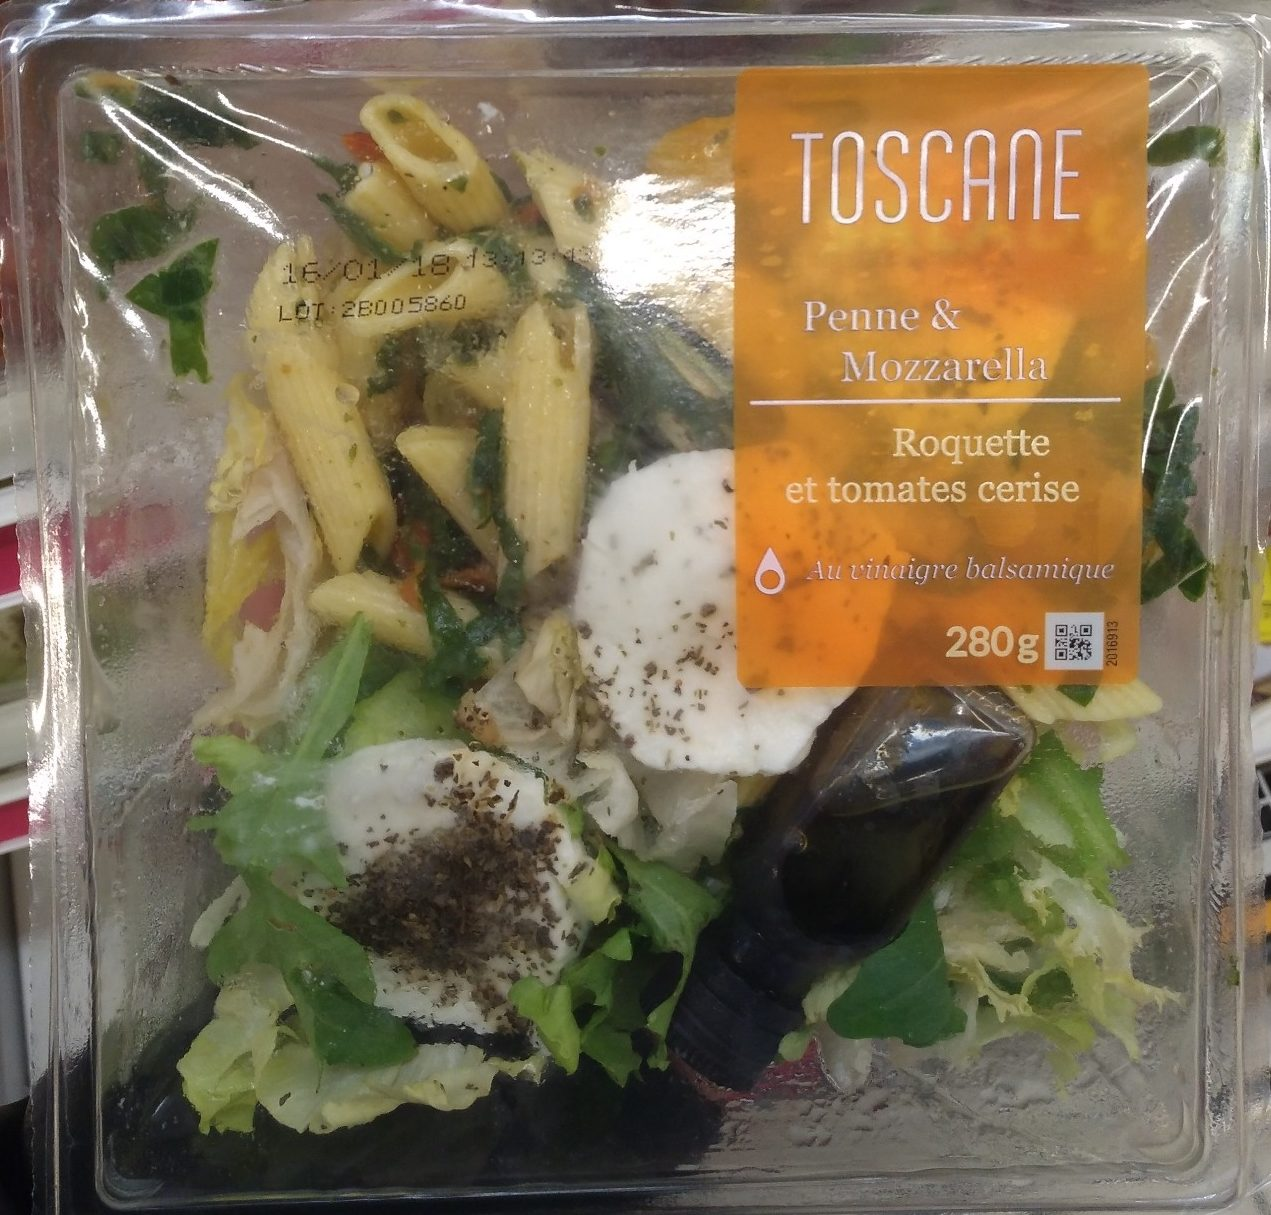 Toscane Penne & Mozzarella - Produit - fr